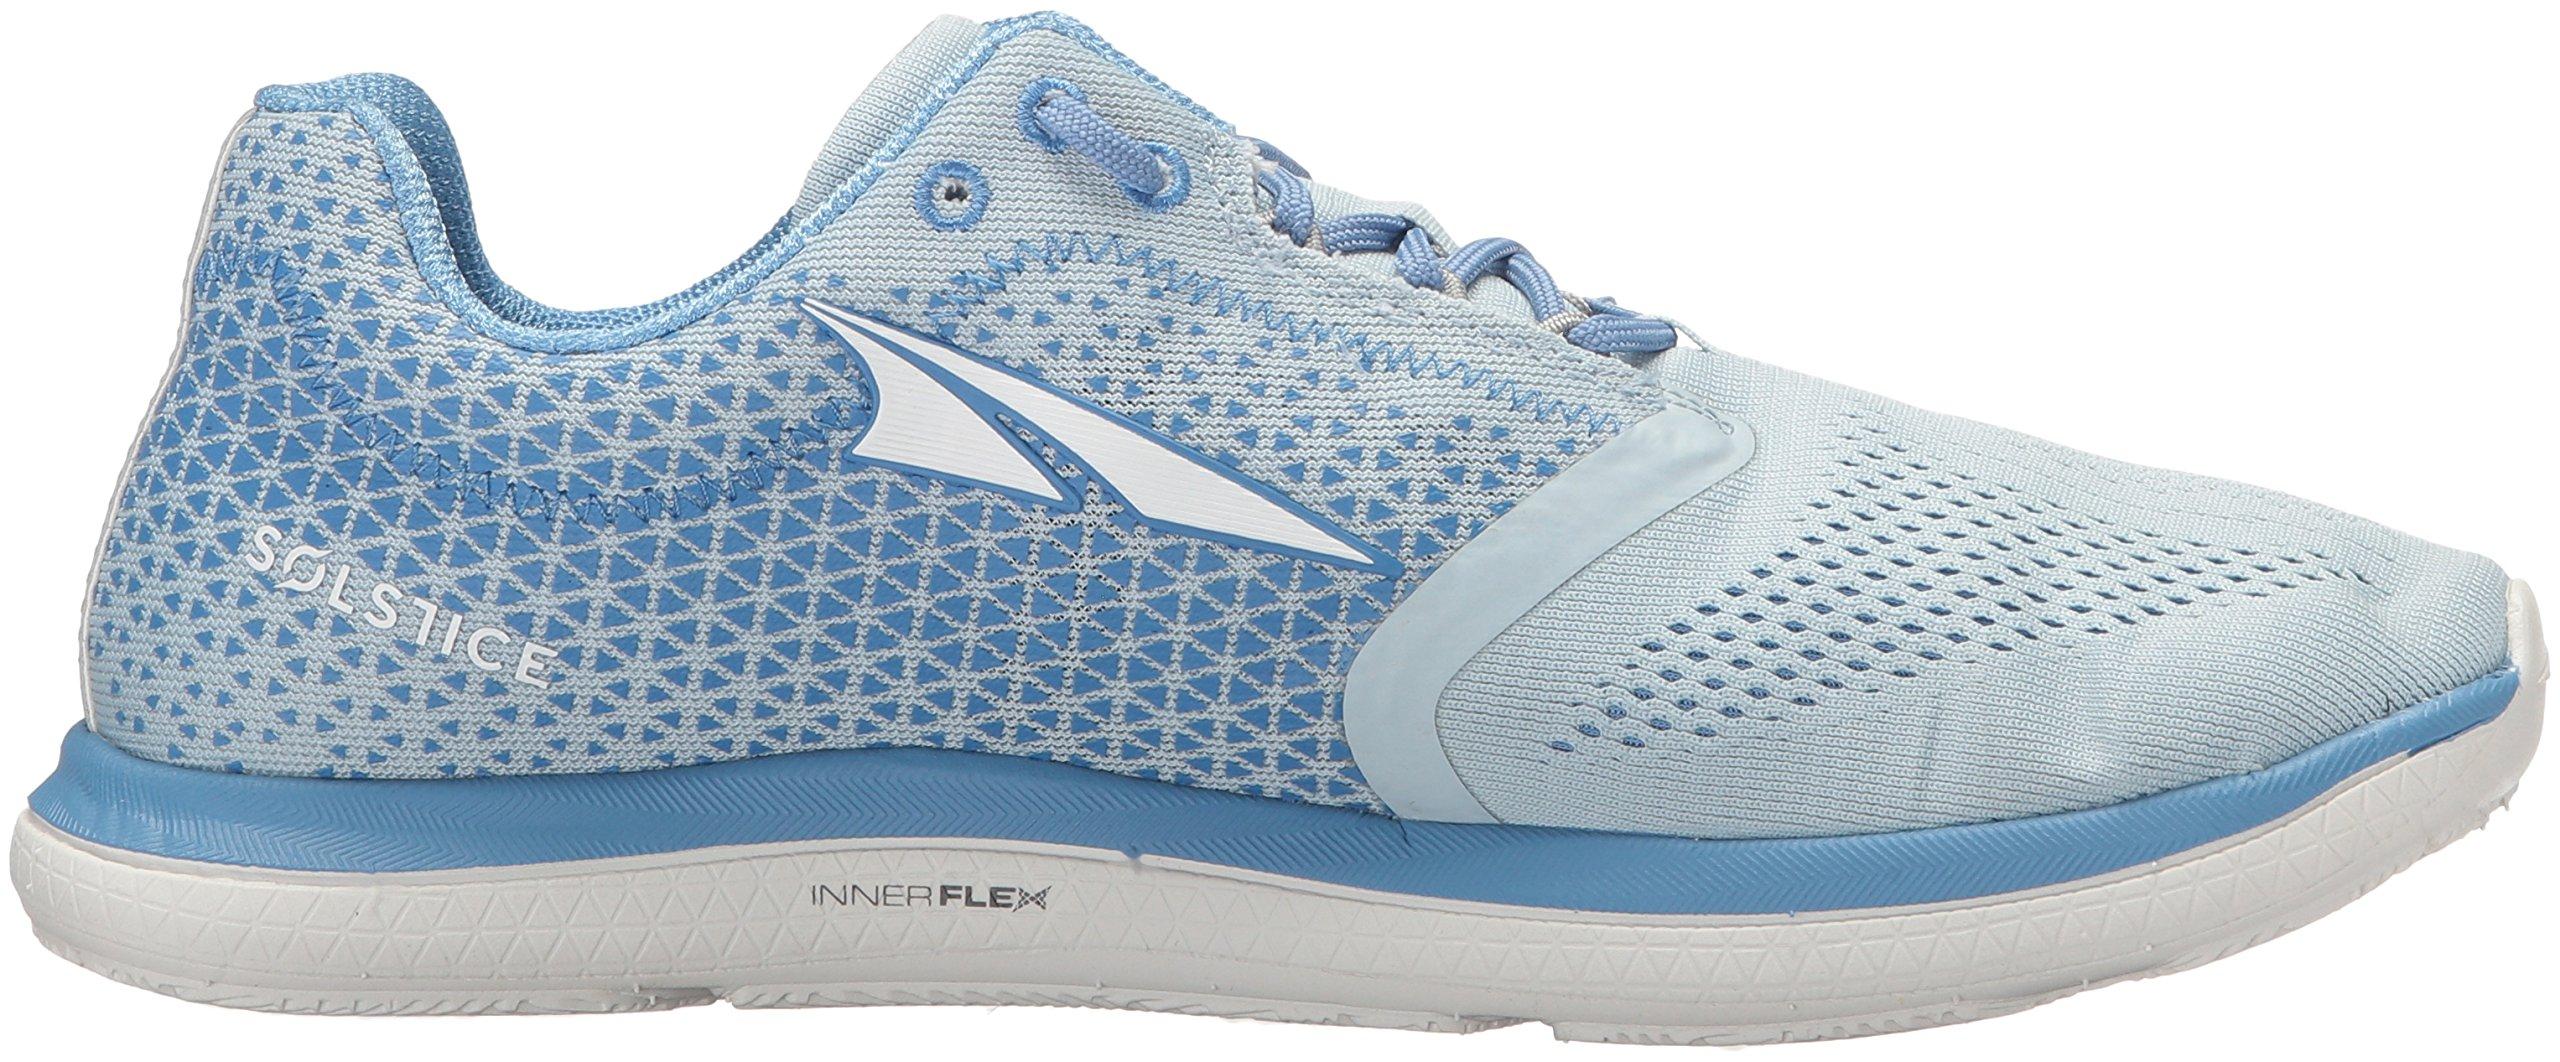 Altra Women's Solstice Sneaker Blue 6 Regular US by Altra (Image #6)